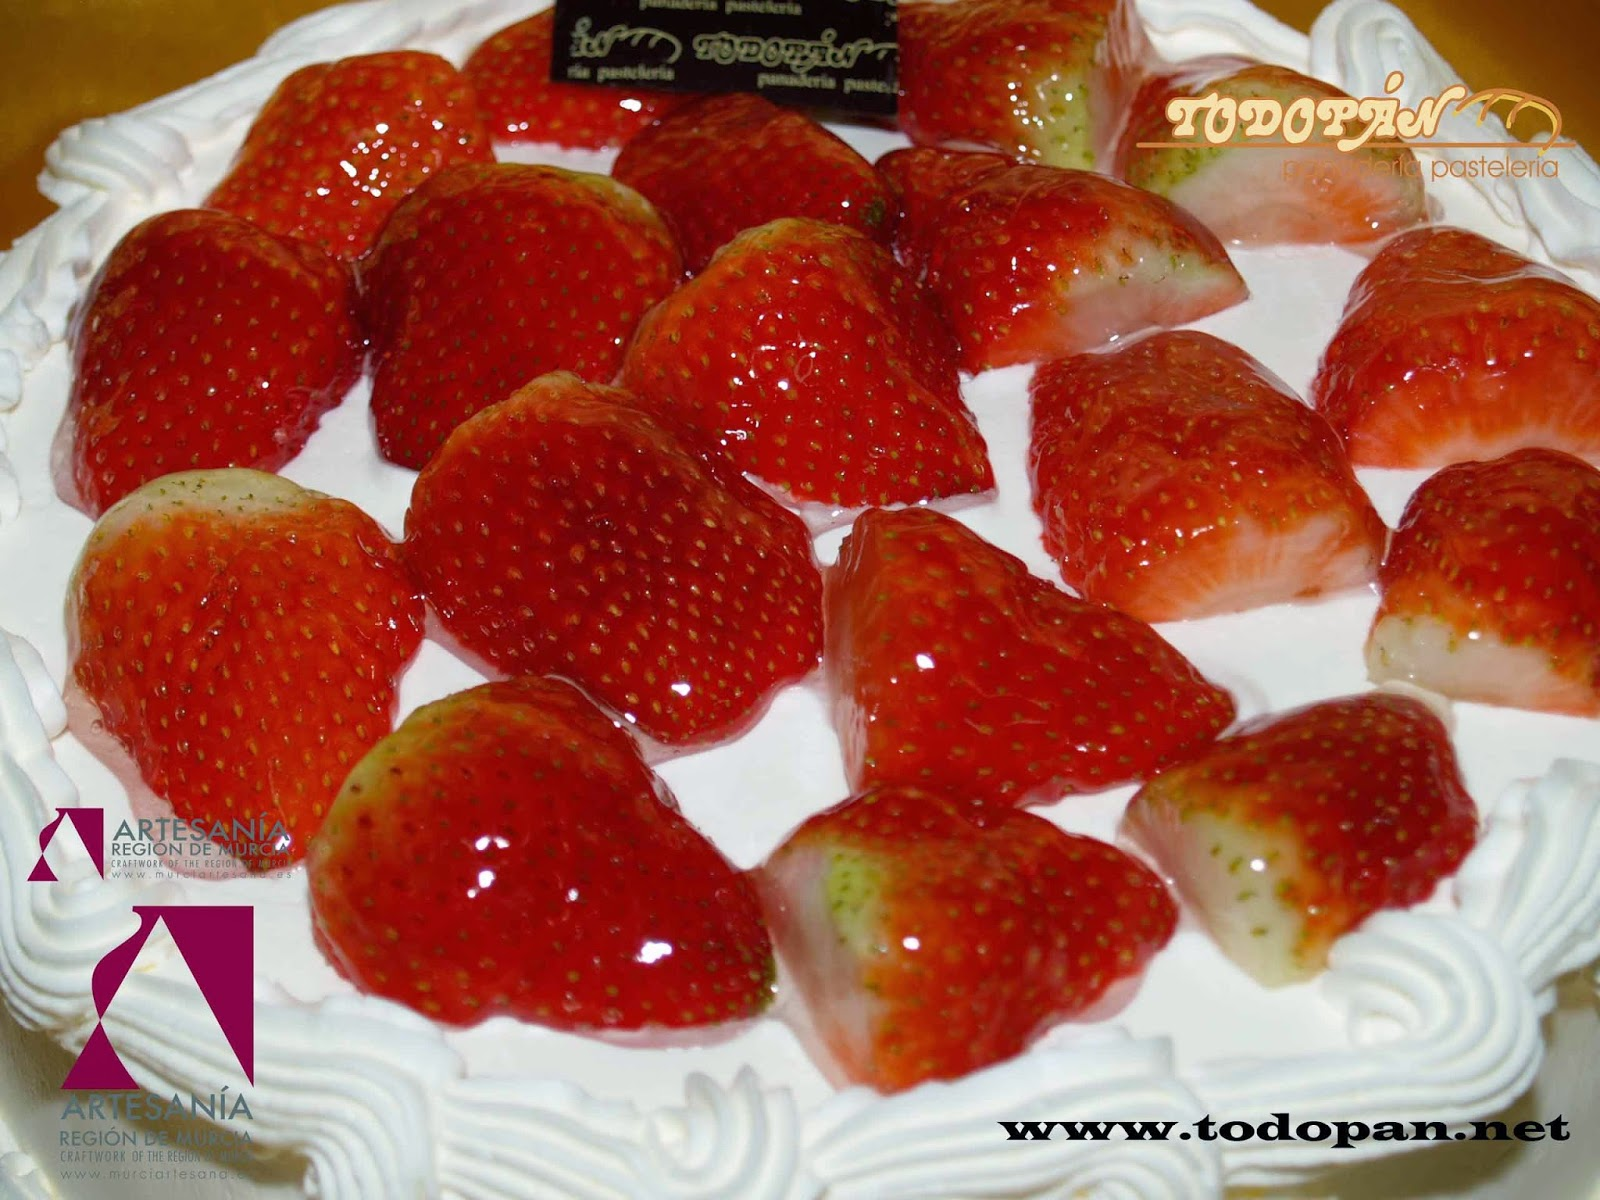 Nata y Fresas